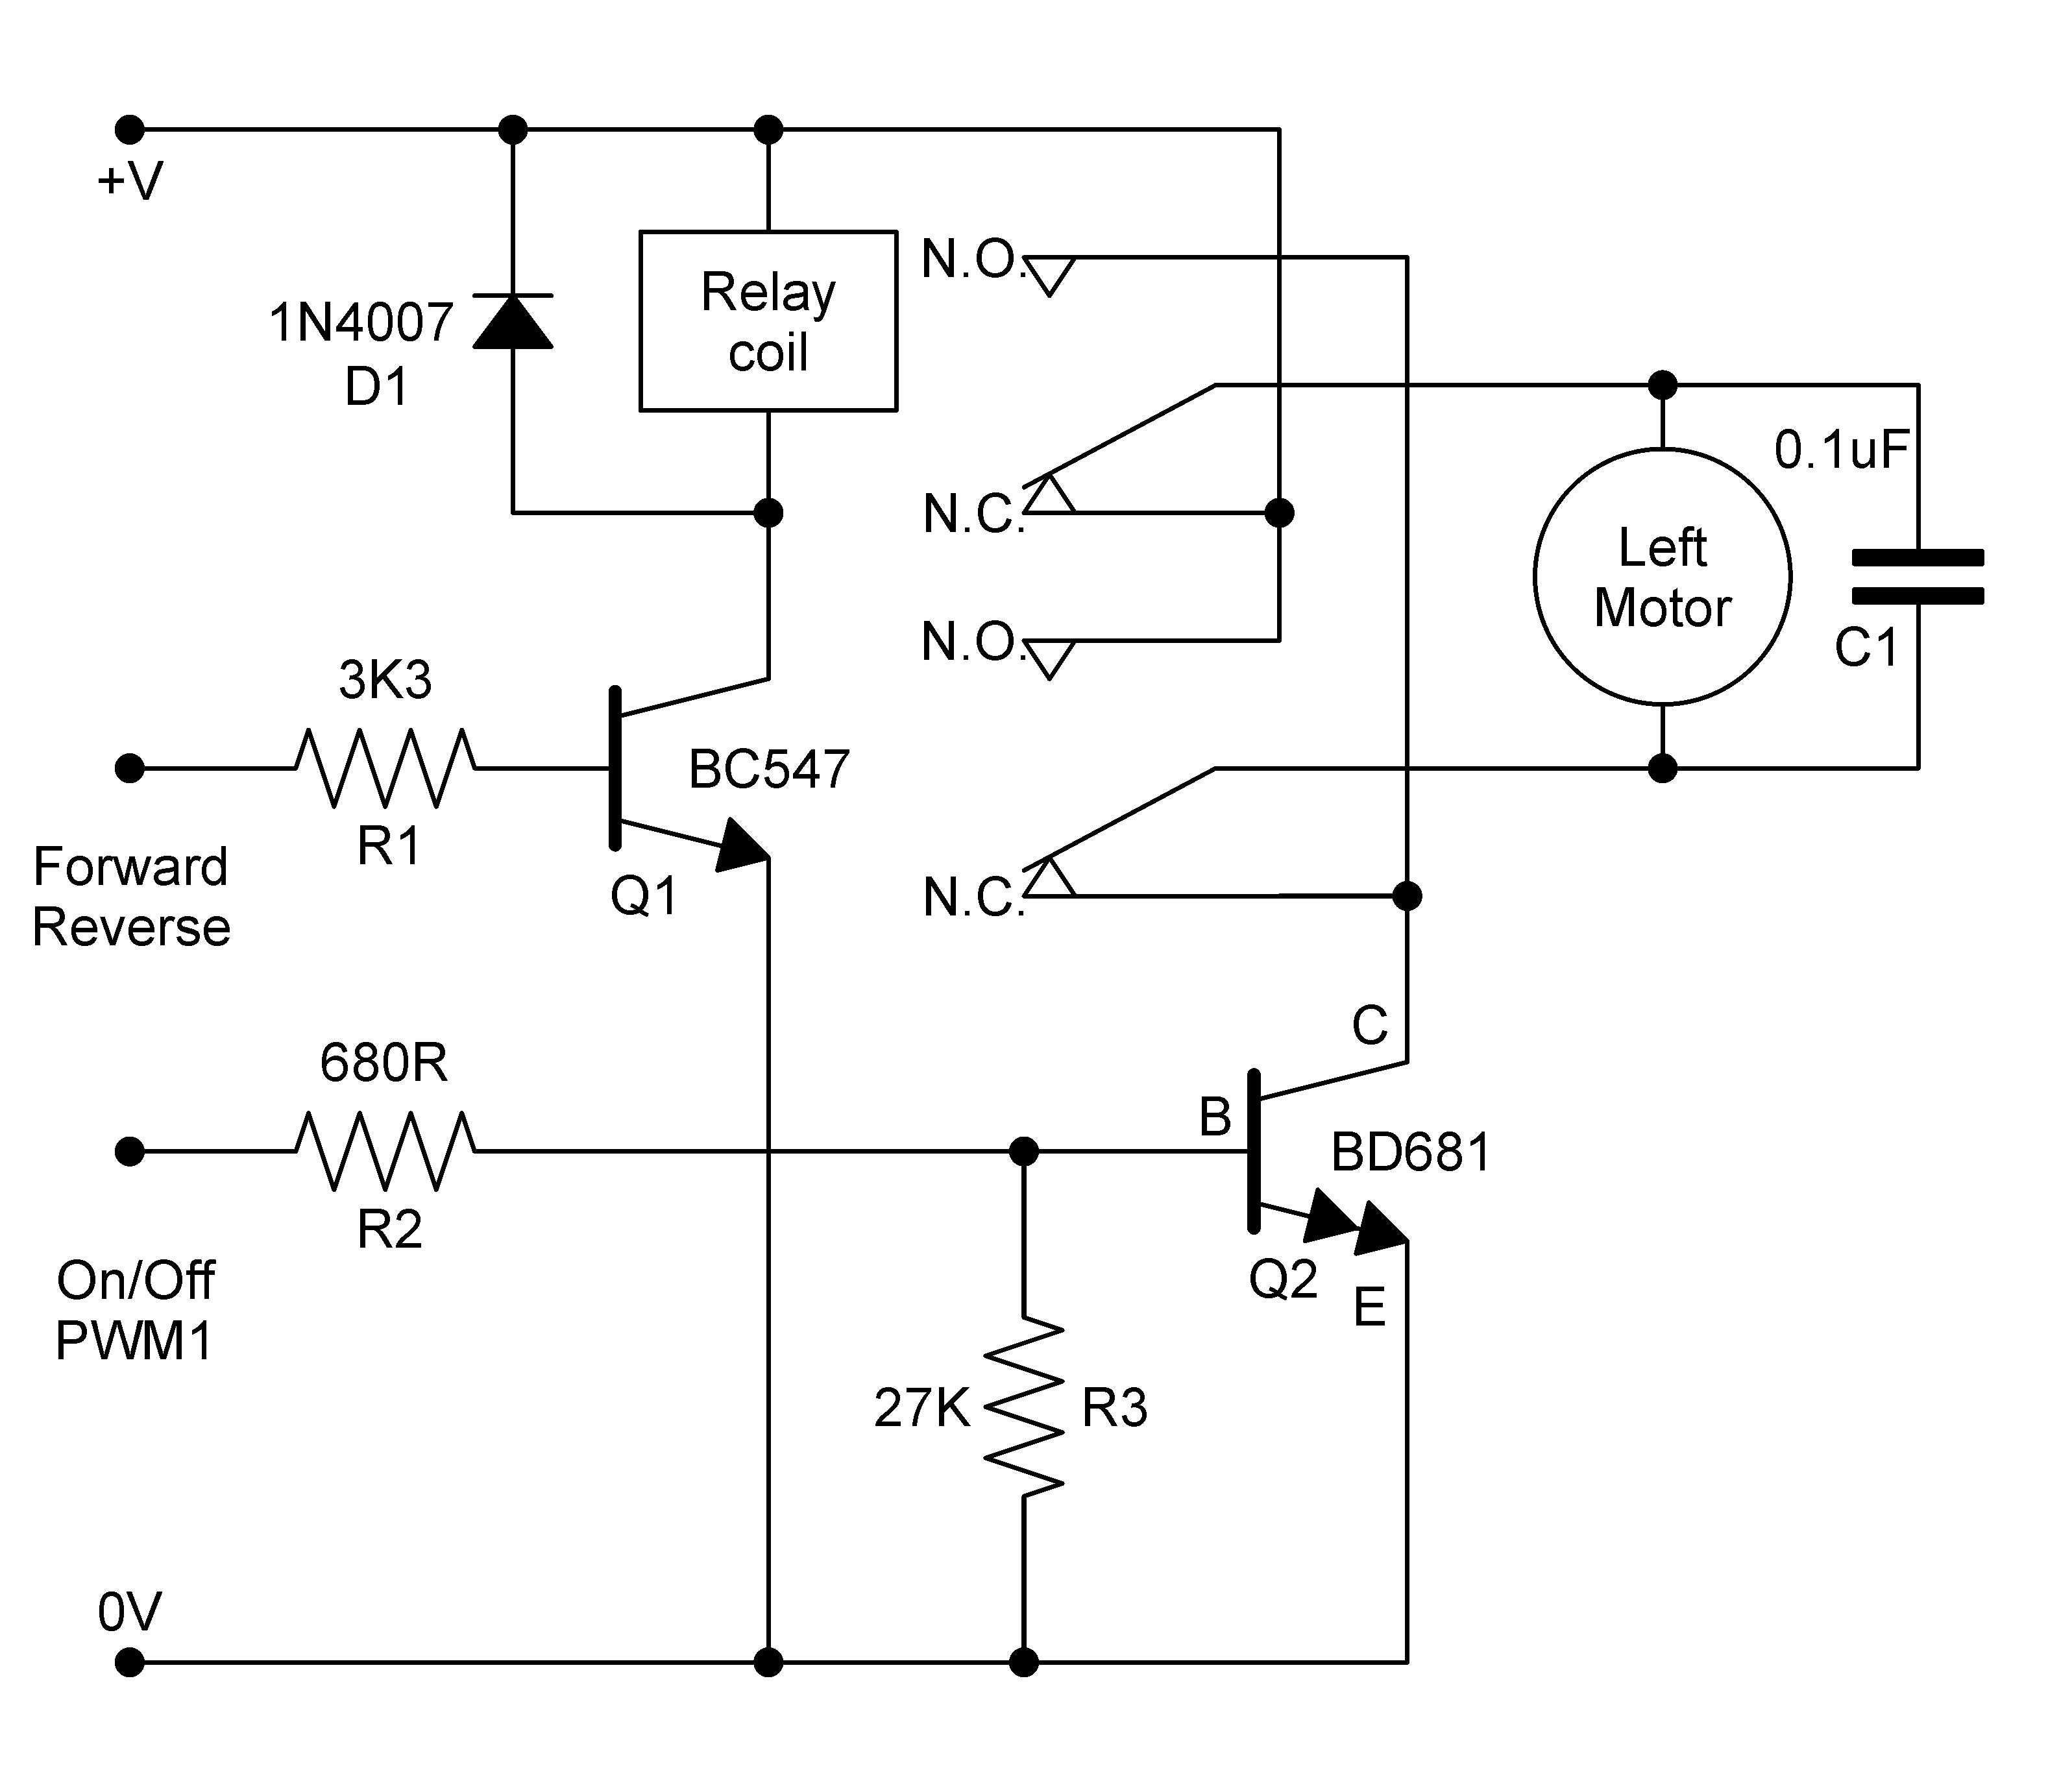 power door lock relay wiring diagram robotic circuit : automation circuits :: next.gr relay wiring diagram 7234 #7